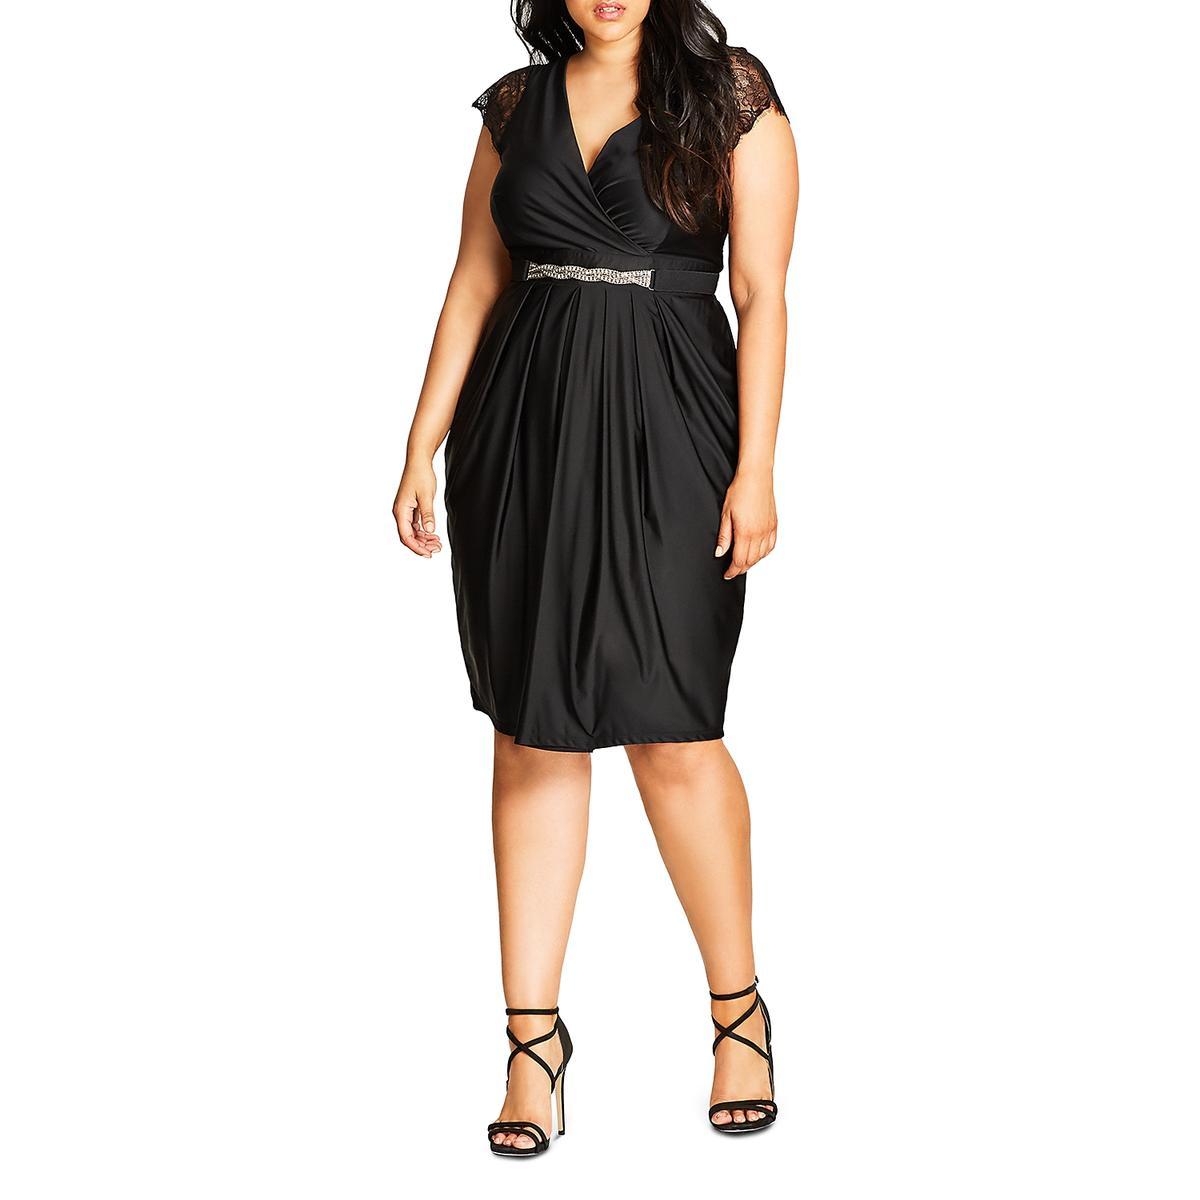 Details about City Chic Womens Black Flirty V-Neck Semi-Formal Dress Plus  22W XL BHFO 7337 5b6609cc6